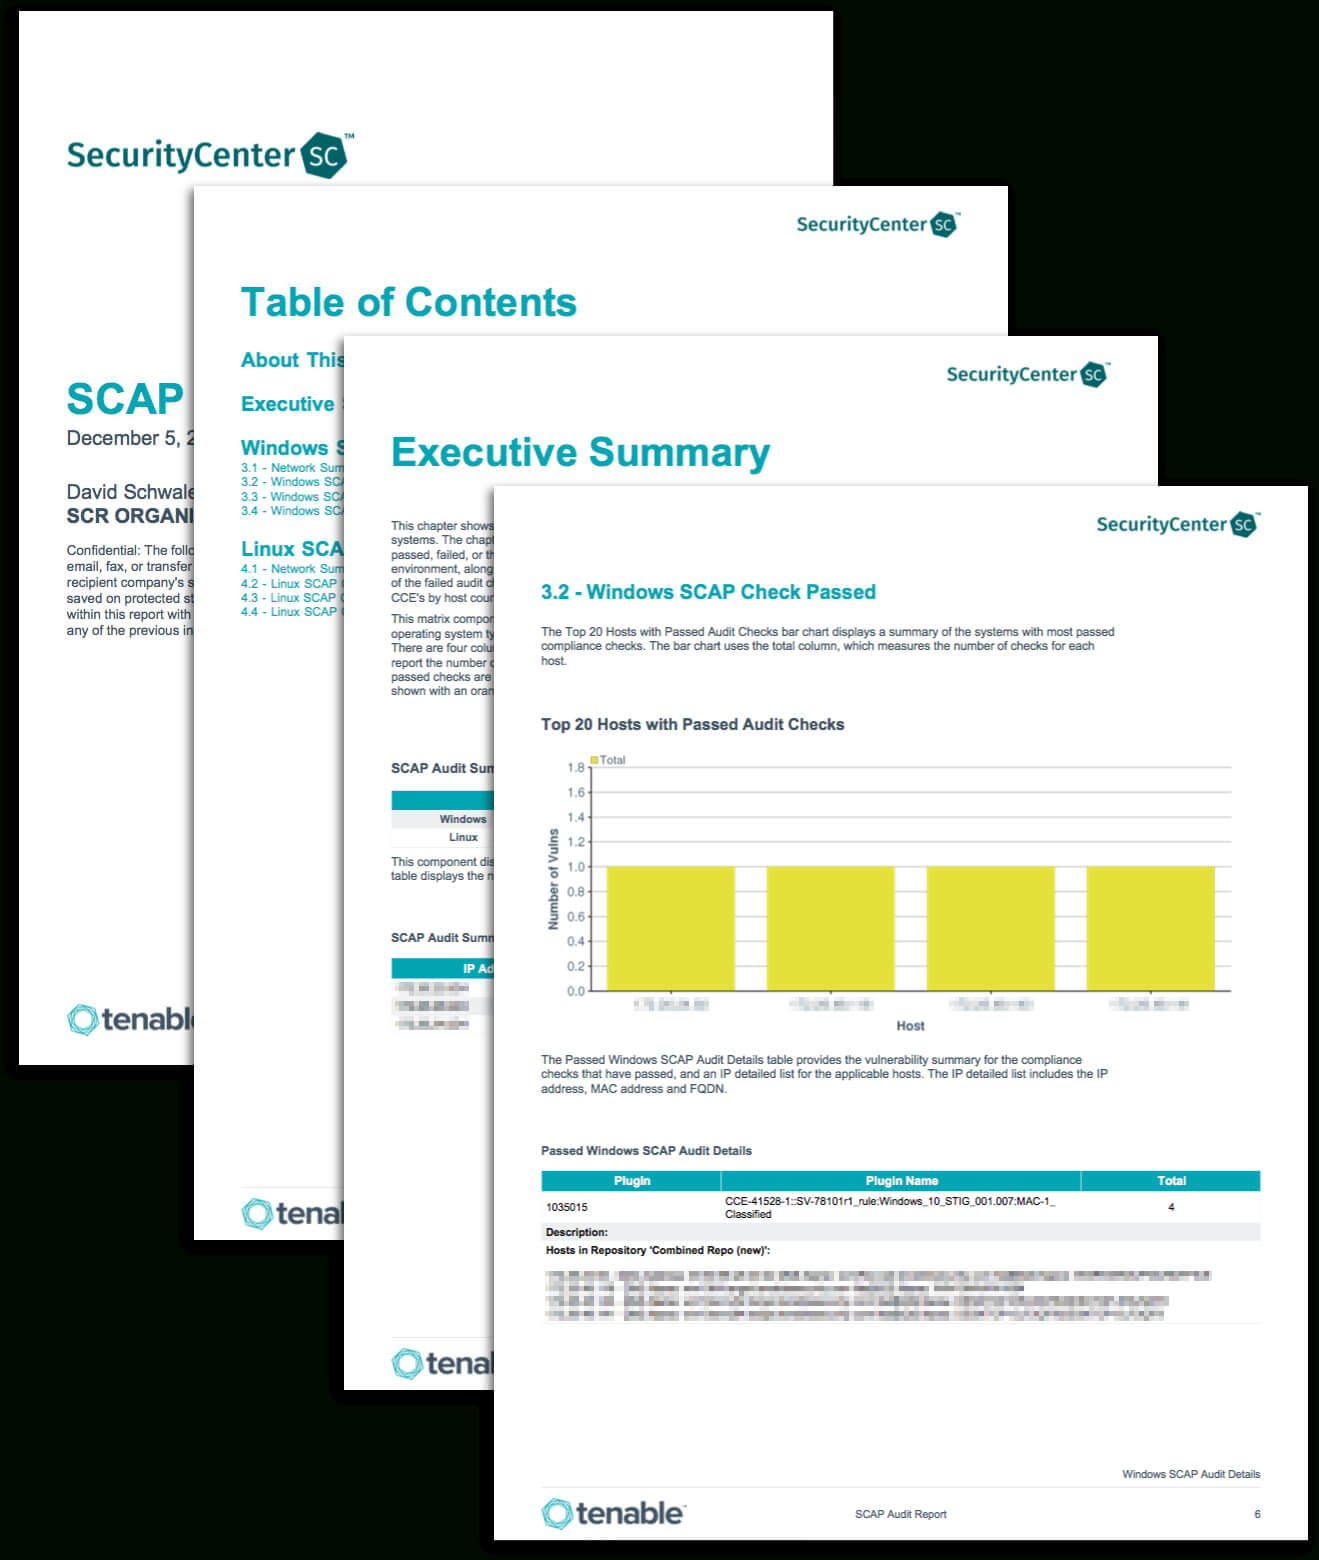 Scap Audit Report - Sc Report Template | Tenable® In Security Audit Report Template